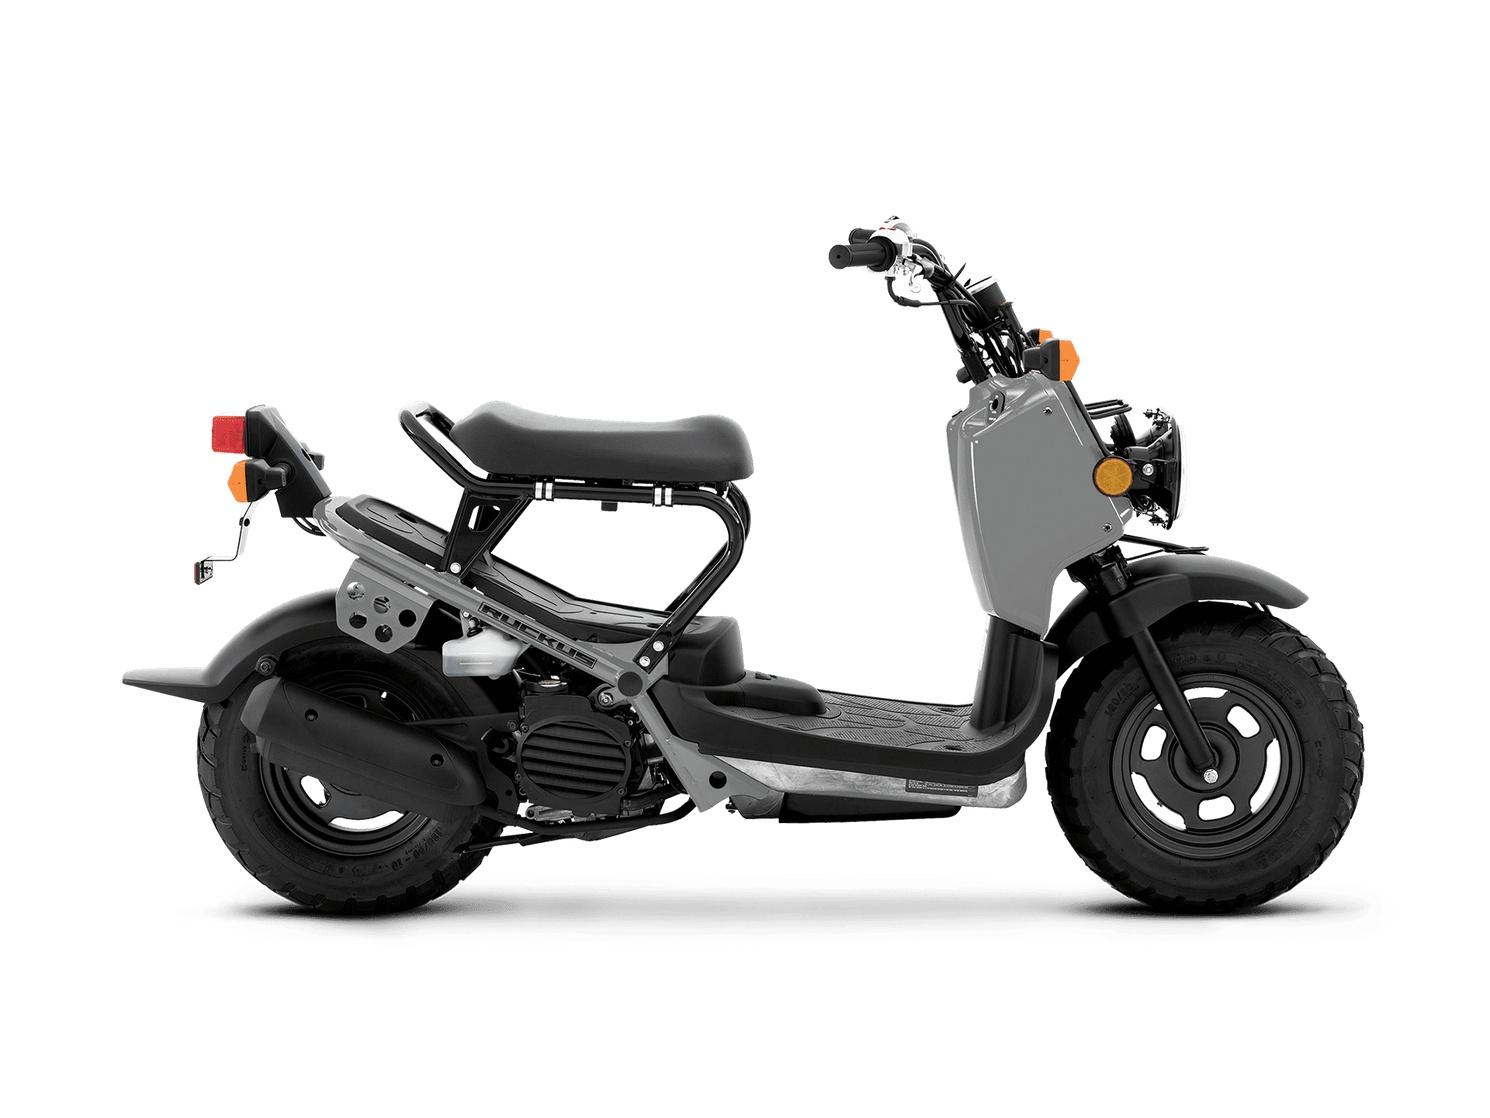 2022 Honda Ruckus Frais inclus+Taxes